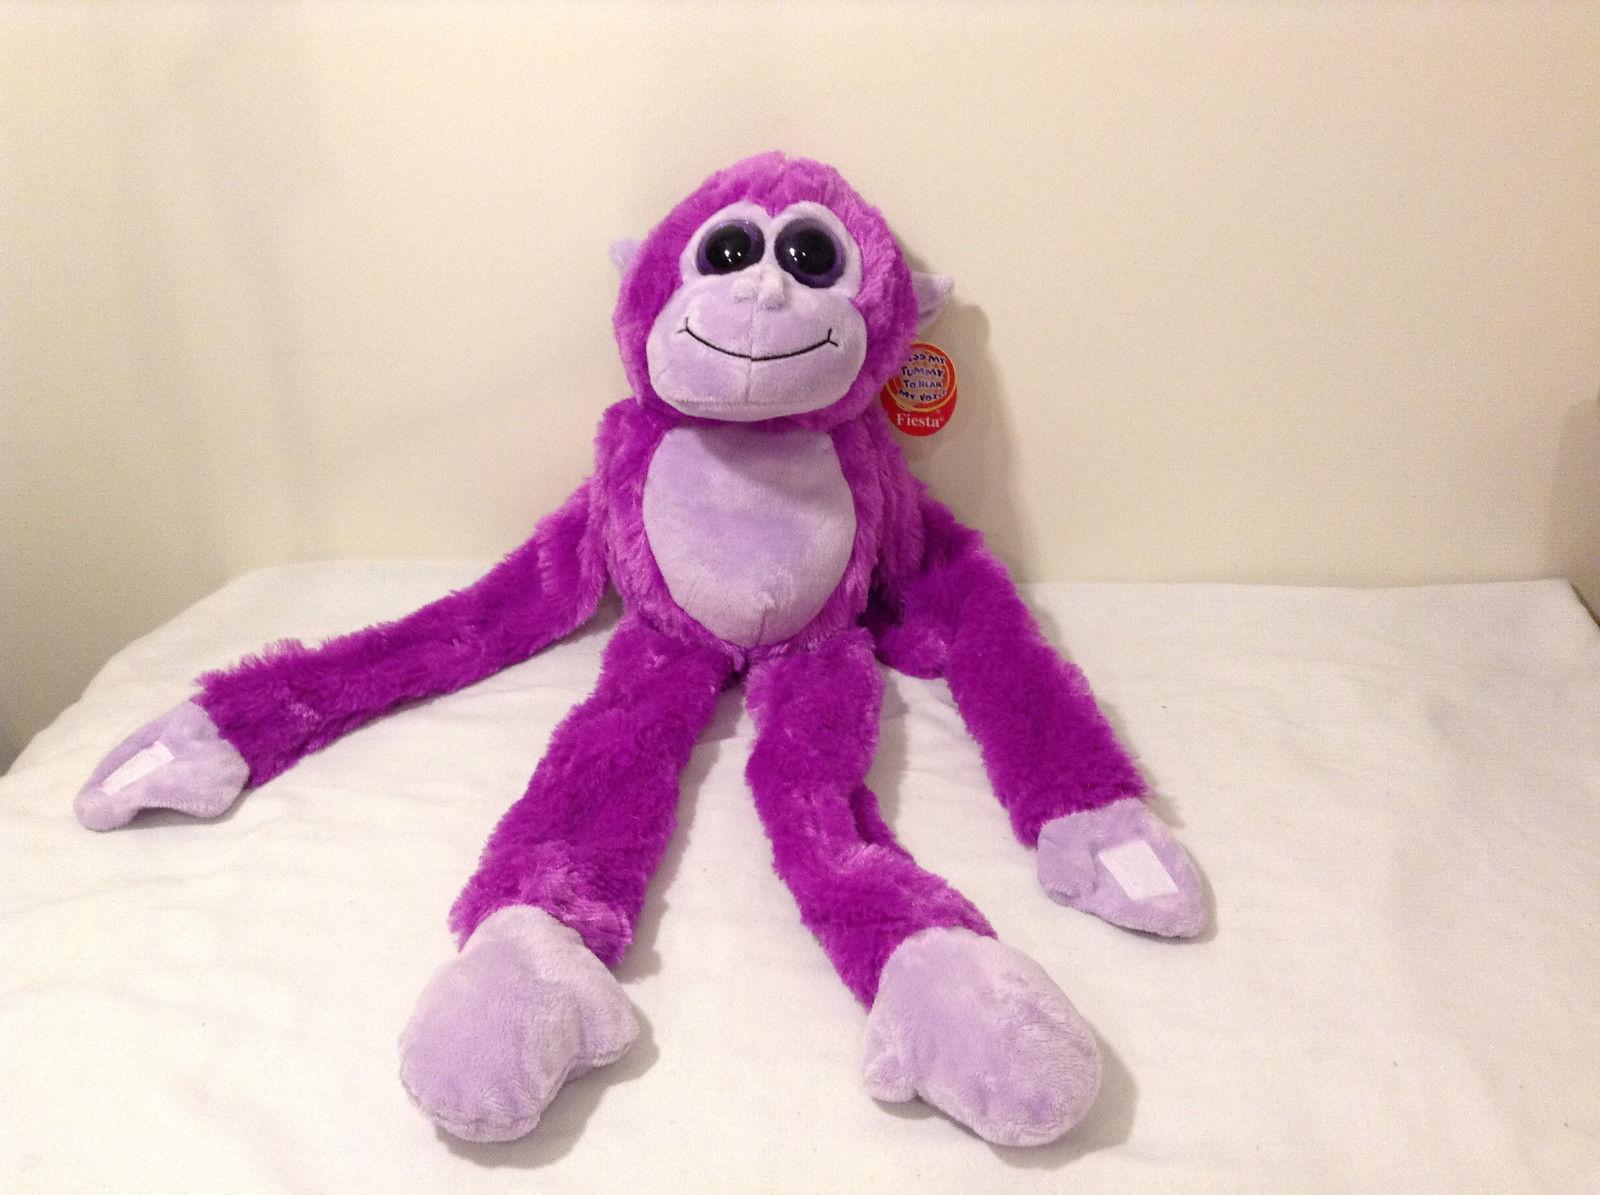 Fiesta Plush Monkey Stuffed Animal Toy Fuchsia Purple w/ Tummy Belly Sound Noise